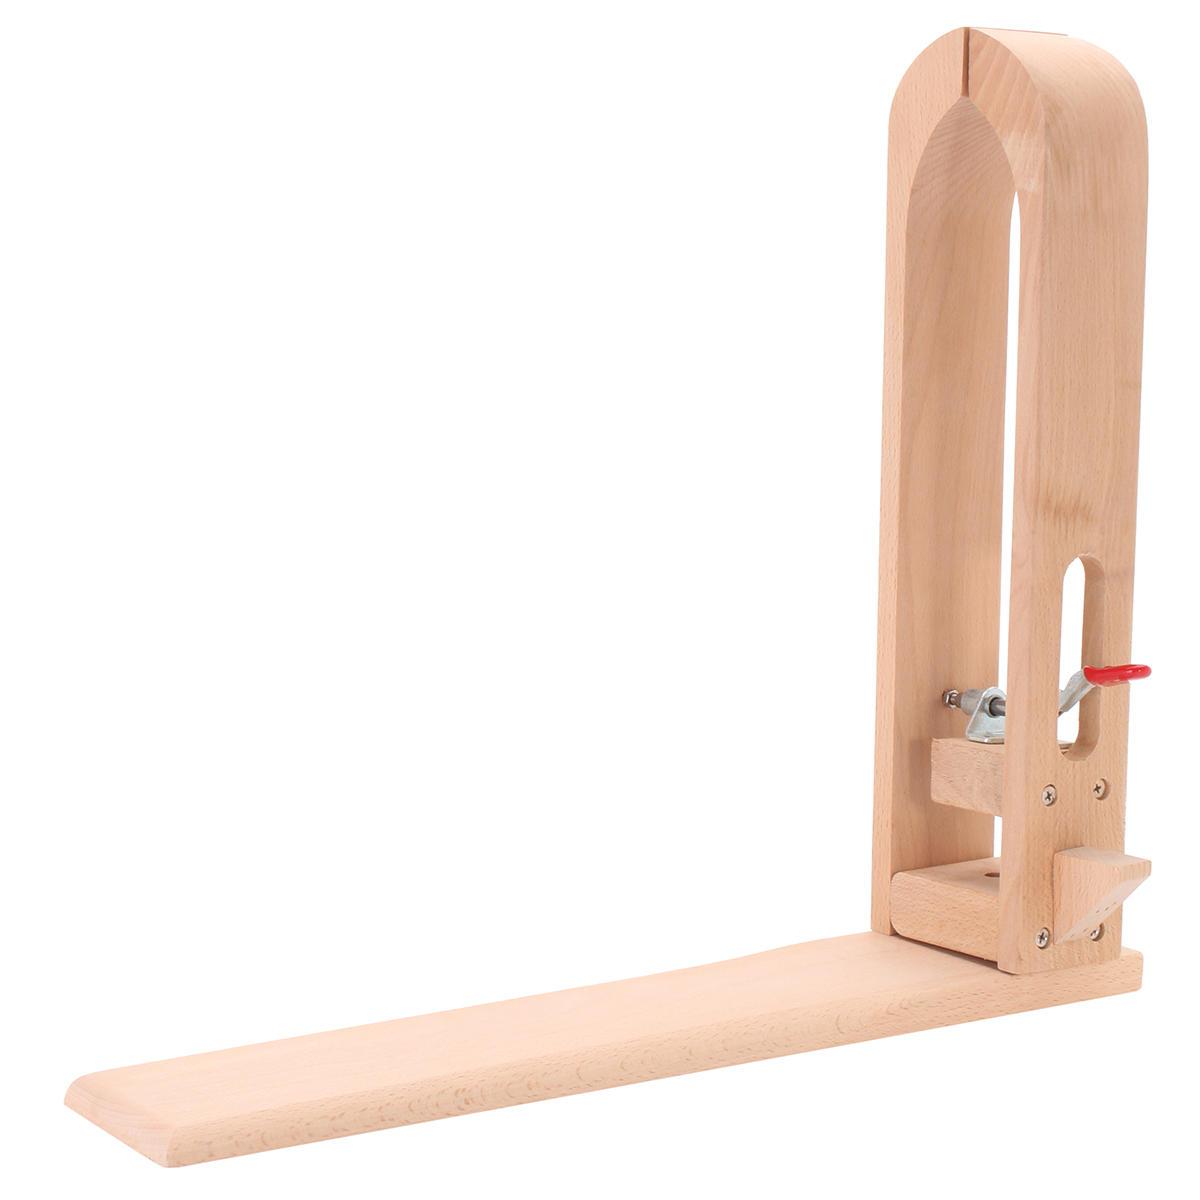 Raitool™ 90 Degree Corner Tool Right Angle Vice Welding Wood Working Clamps - 1